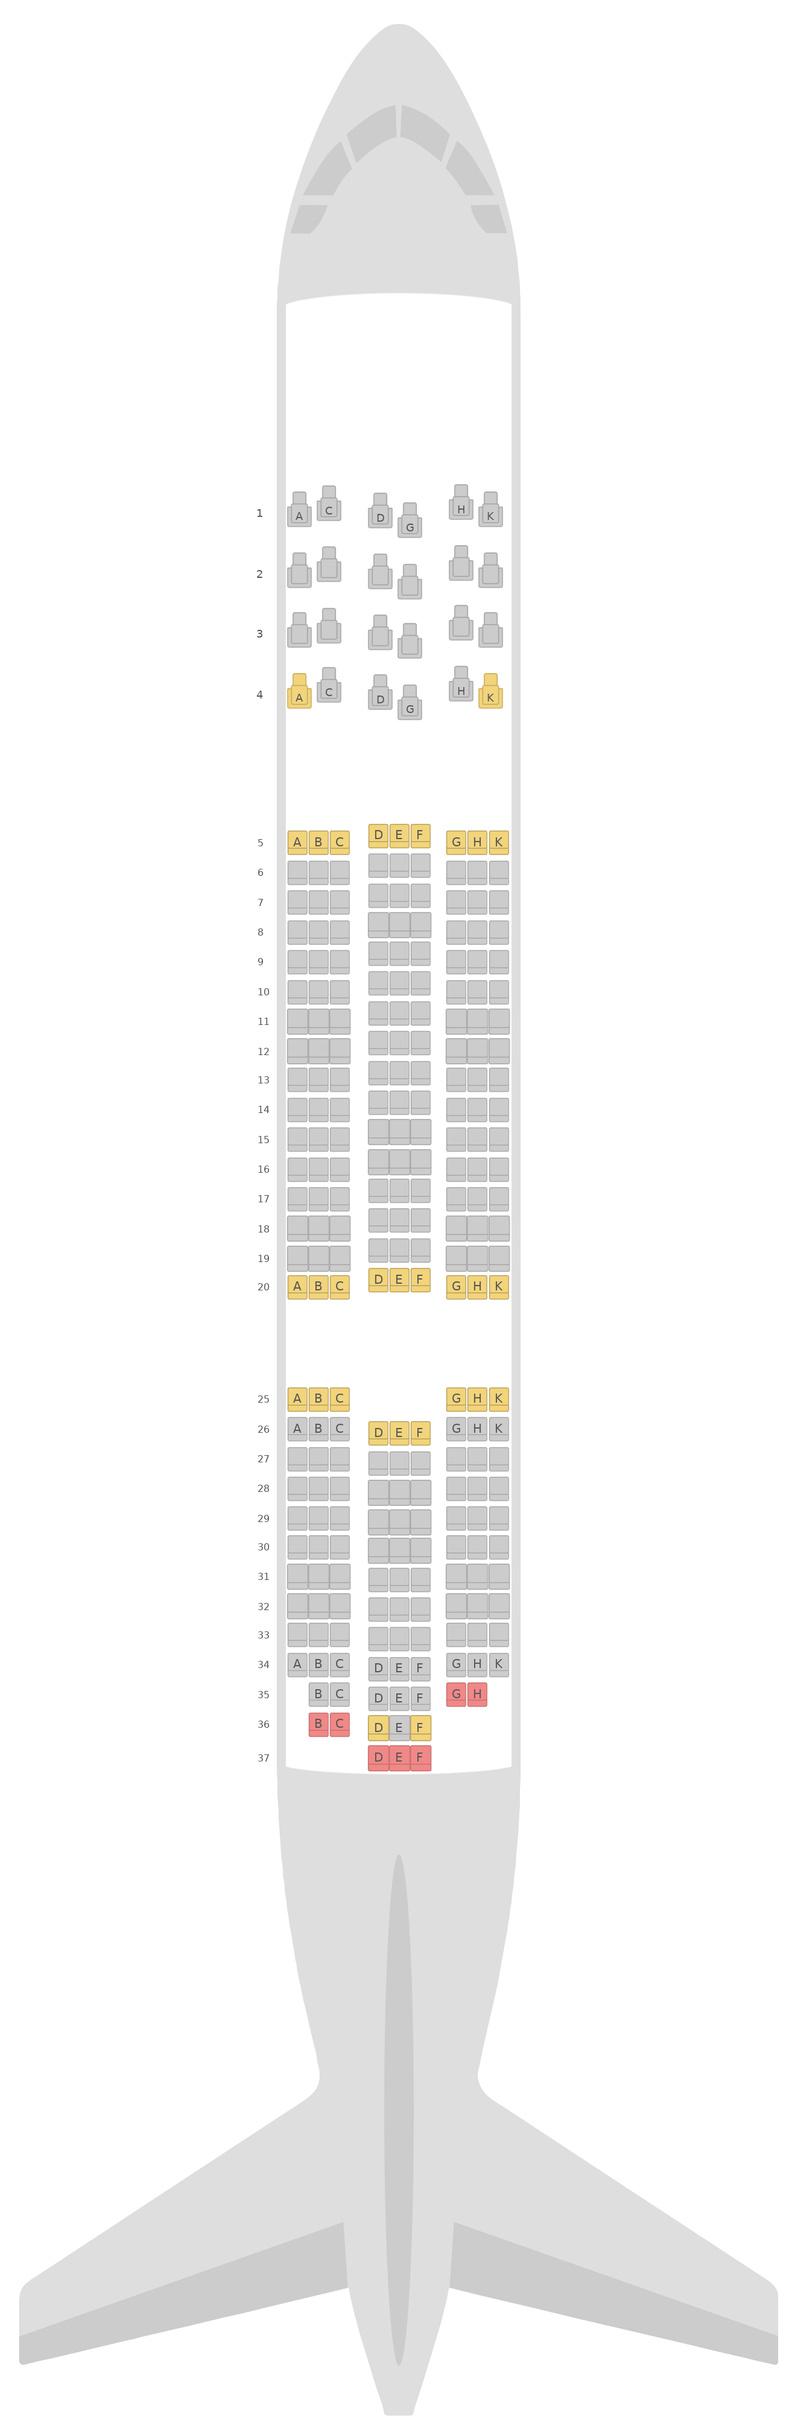 Seat Map Royal Jordanian Airlines Boeing 787-8 (788)